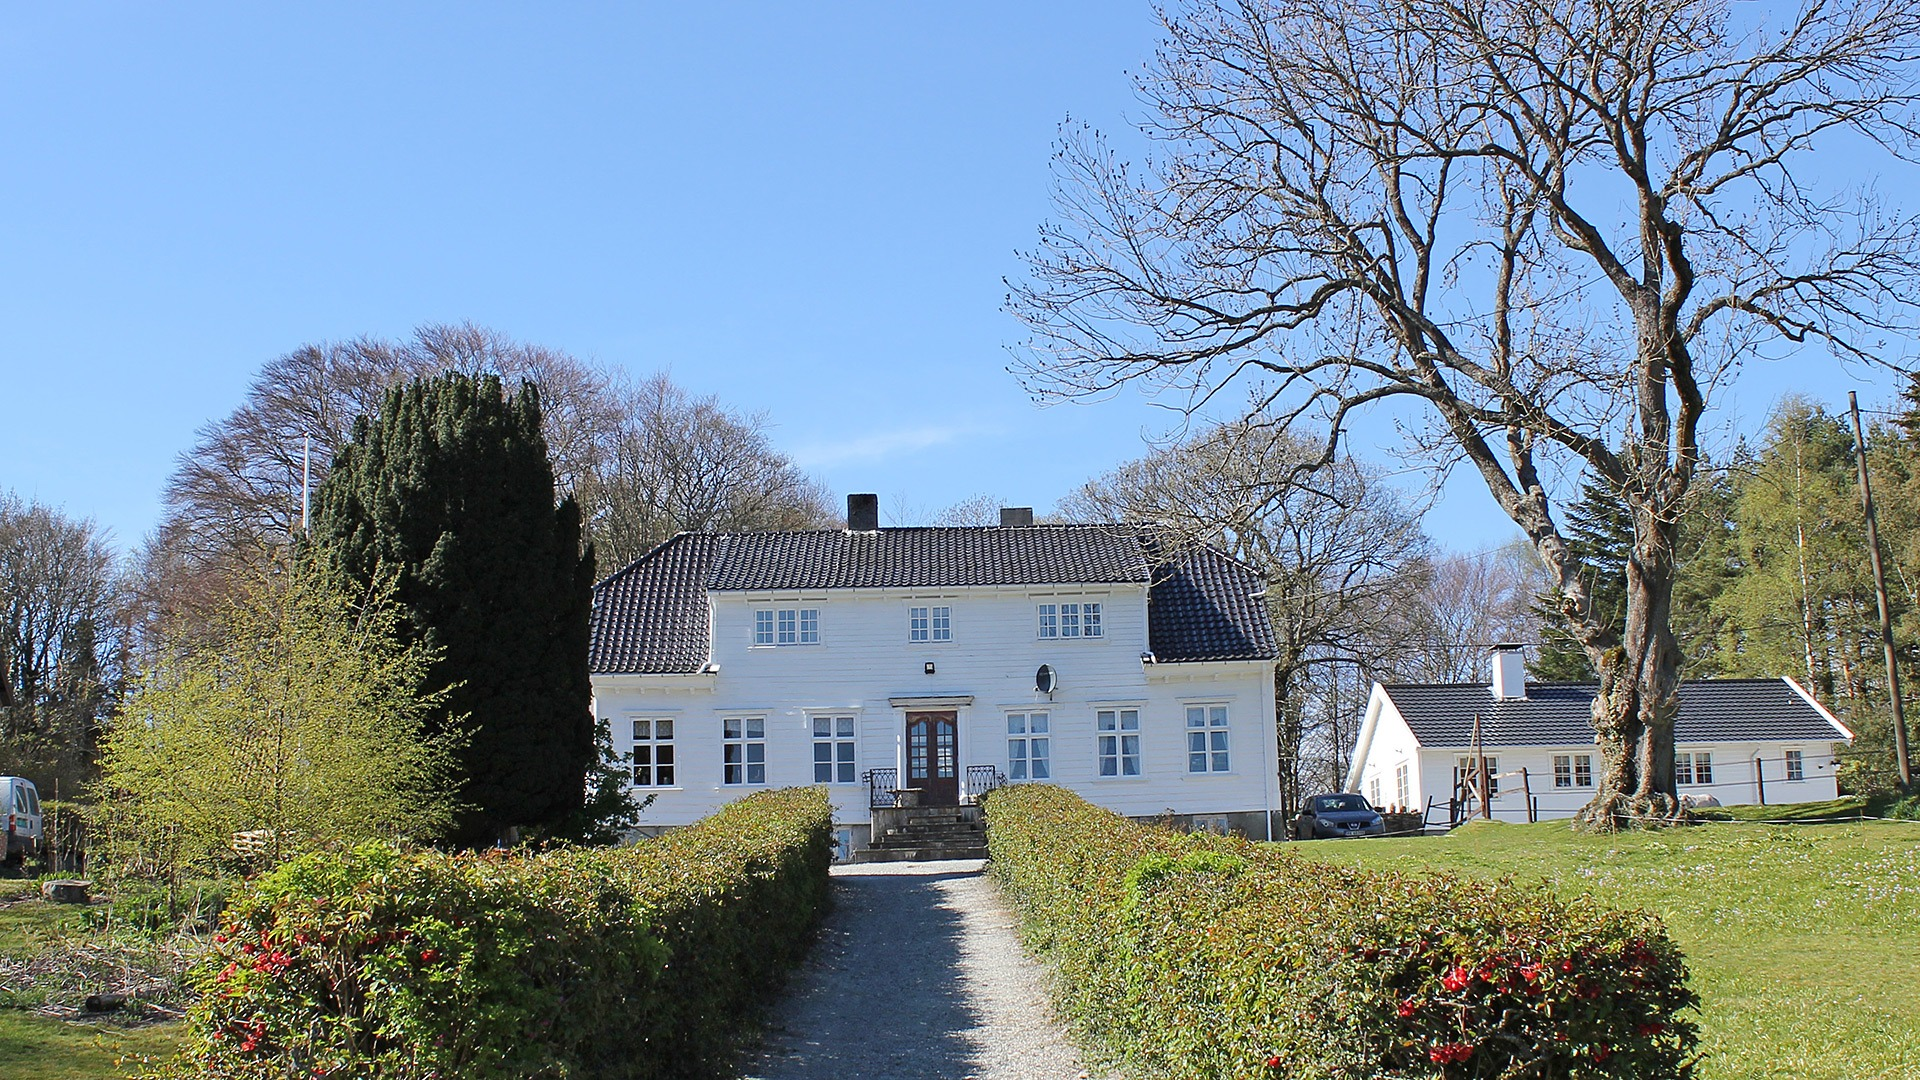 Bilde av Hindal gård i Stavanger kommune. Foto: Per David Martinsen, Riksantikvaren